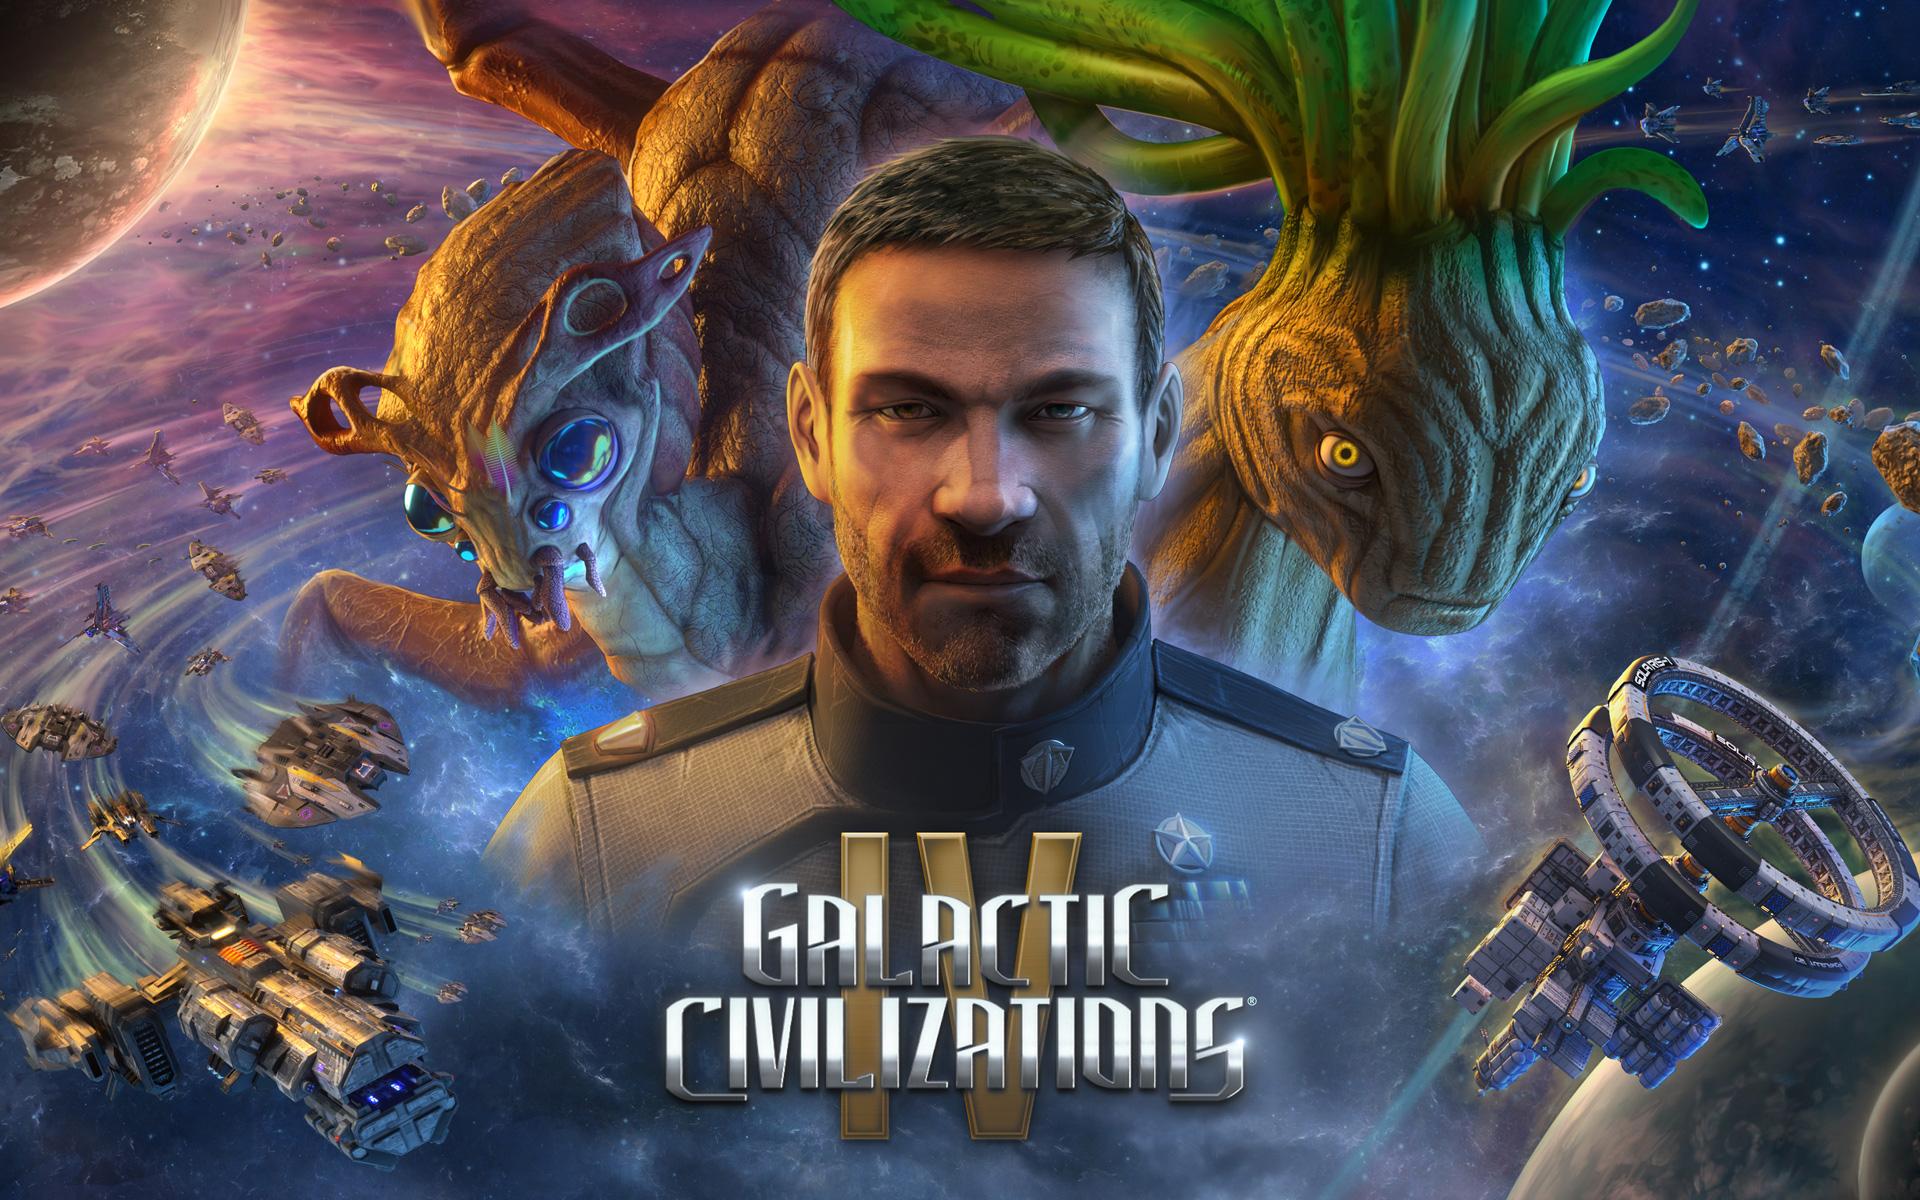 Free Galactic Civilizations IV Wallpaper in 1920x1200